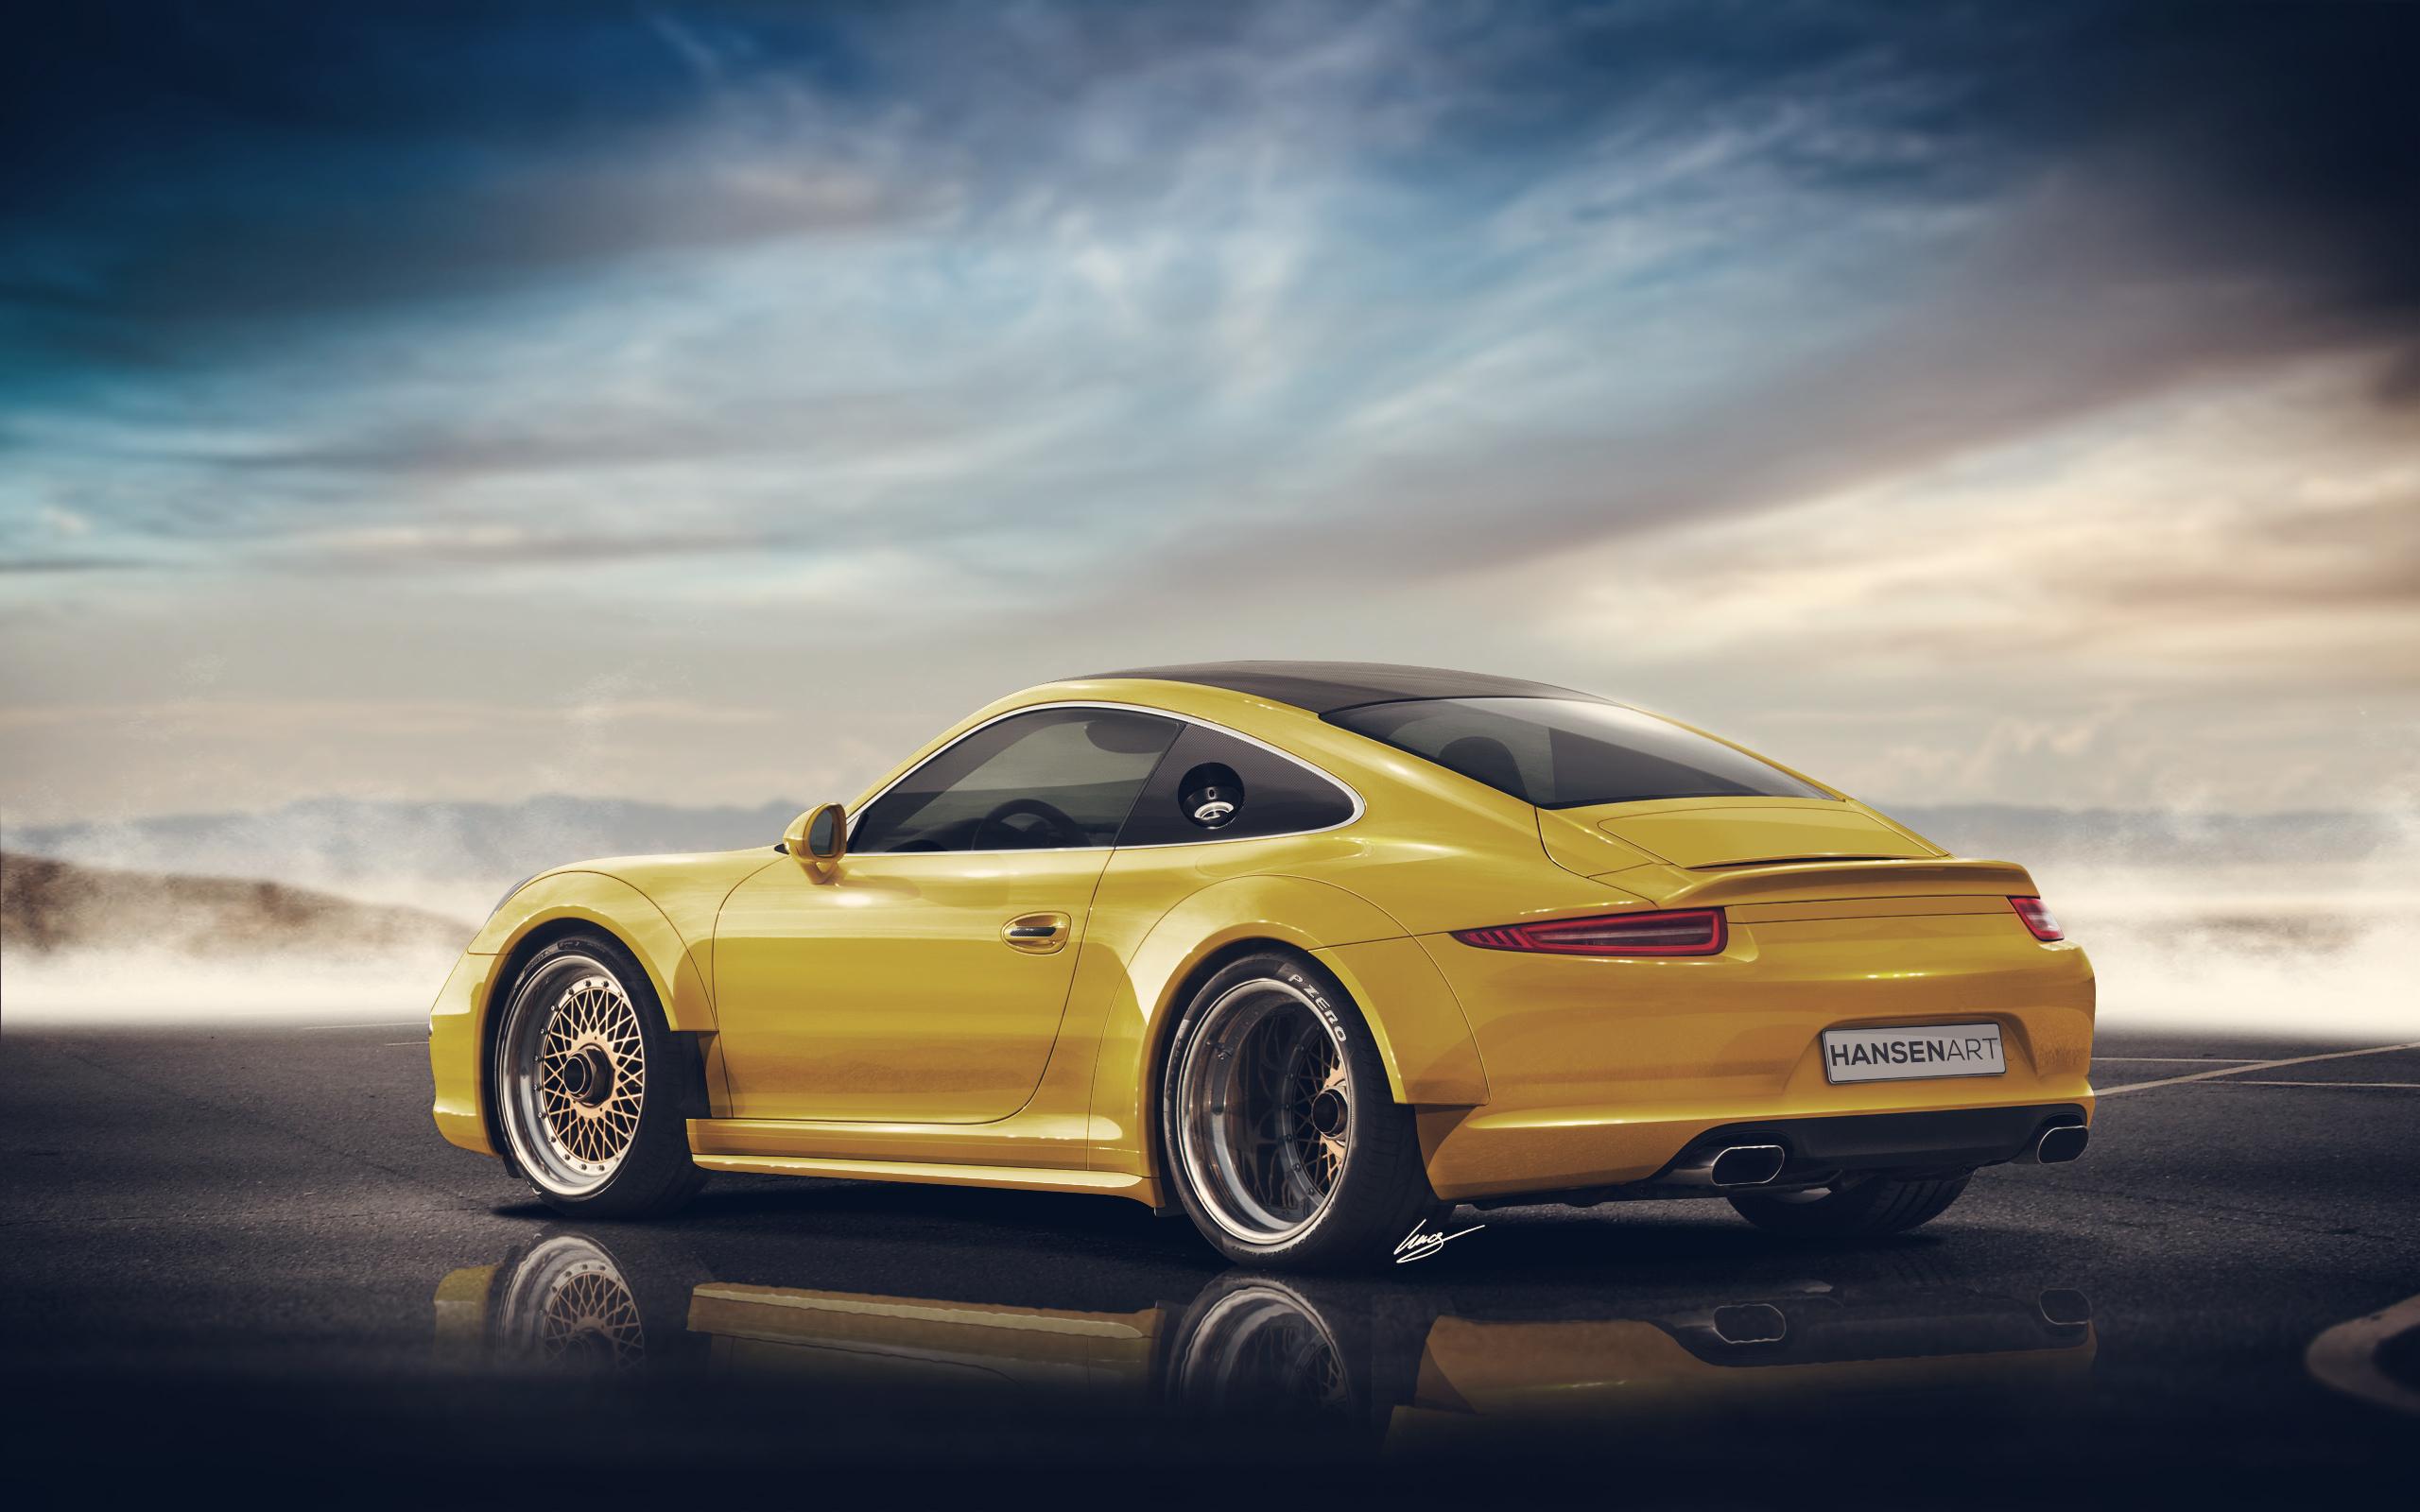 Porsche 911 Widebody Wallpaper  Hd Car Wallpapers  Id #5694